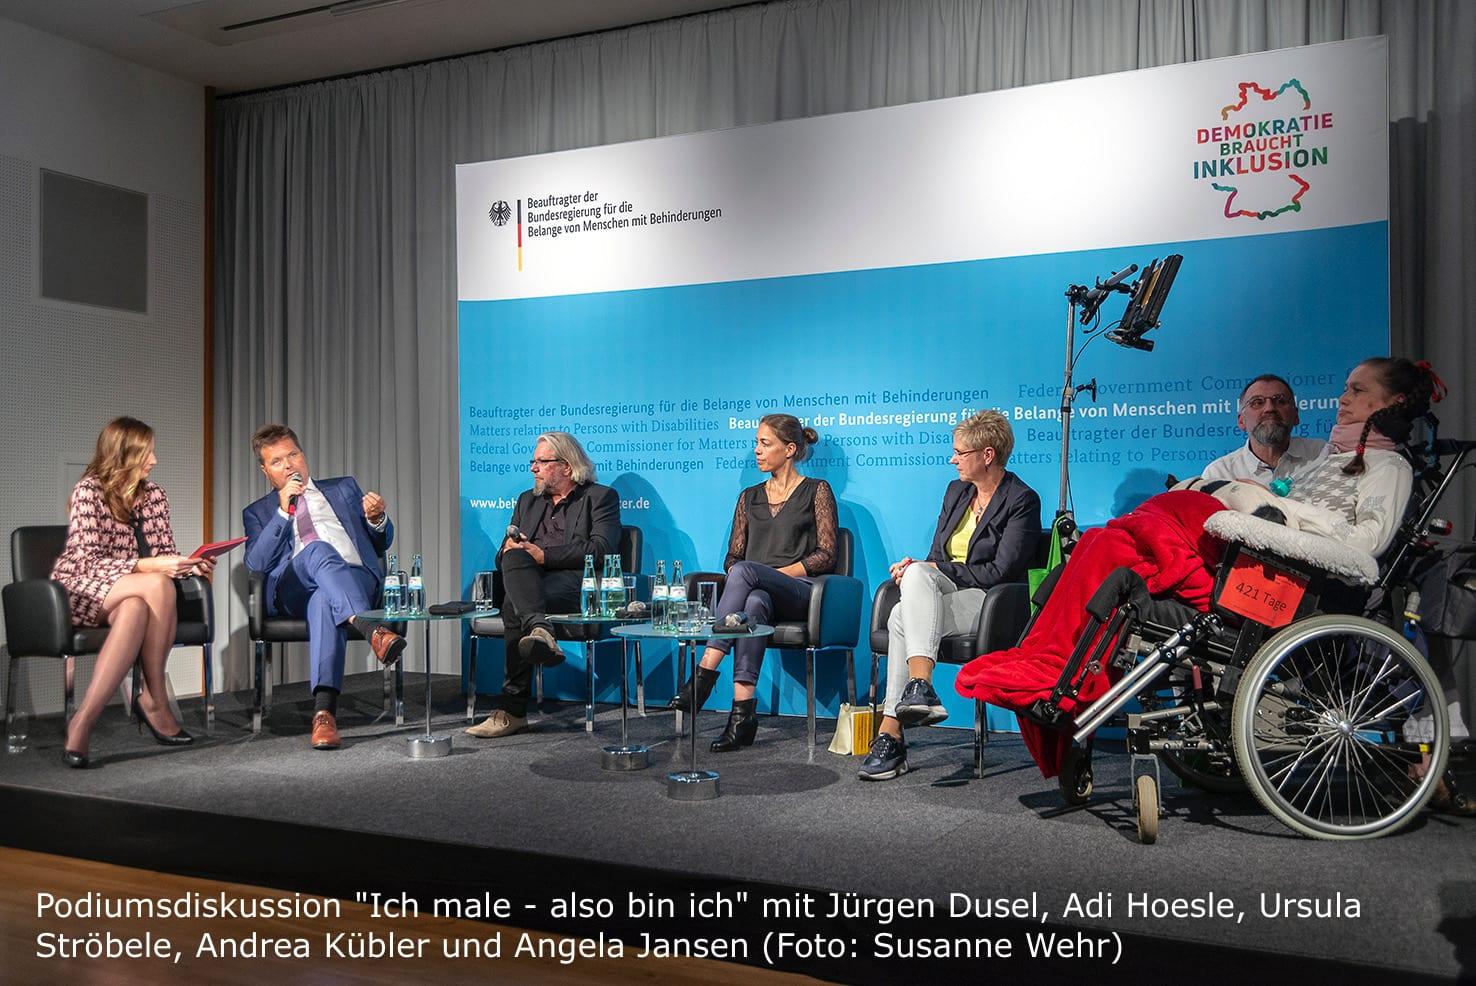 Podiumsdiskussion  Moderatorin Kristina zur Mühlen  Jürgen Dusel  Adi Hoesle  Ursula Ströbele  Andrea Kübler  Angela Jansen